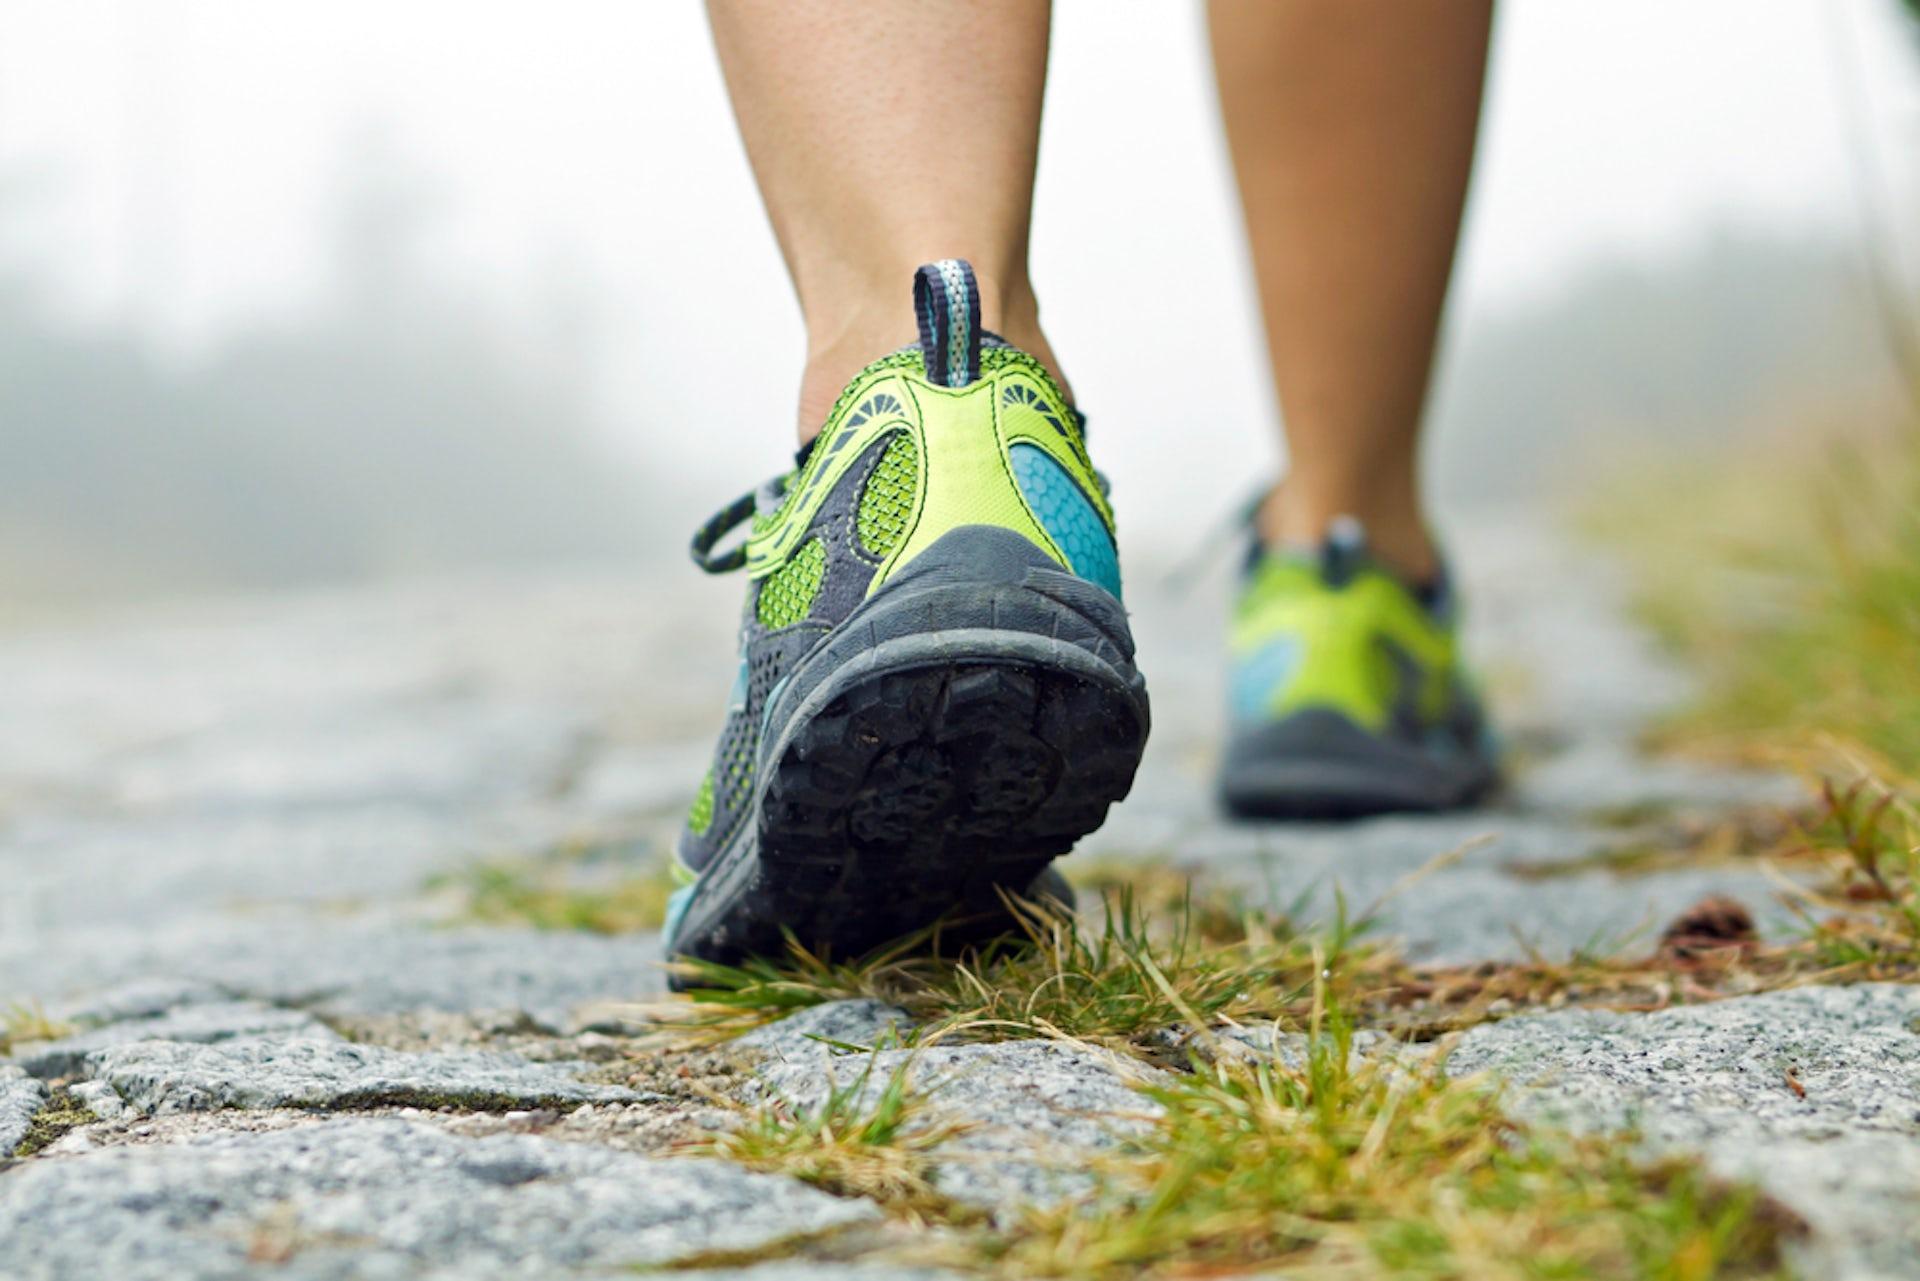 Short bursts of exercise key to feeling full